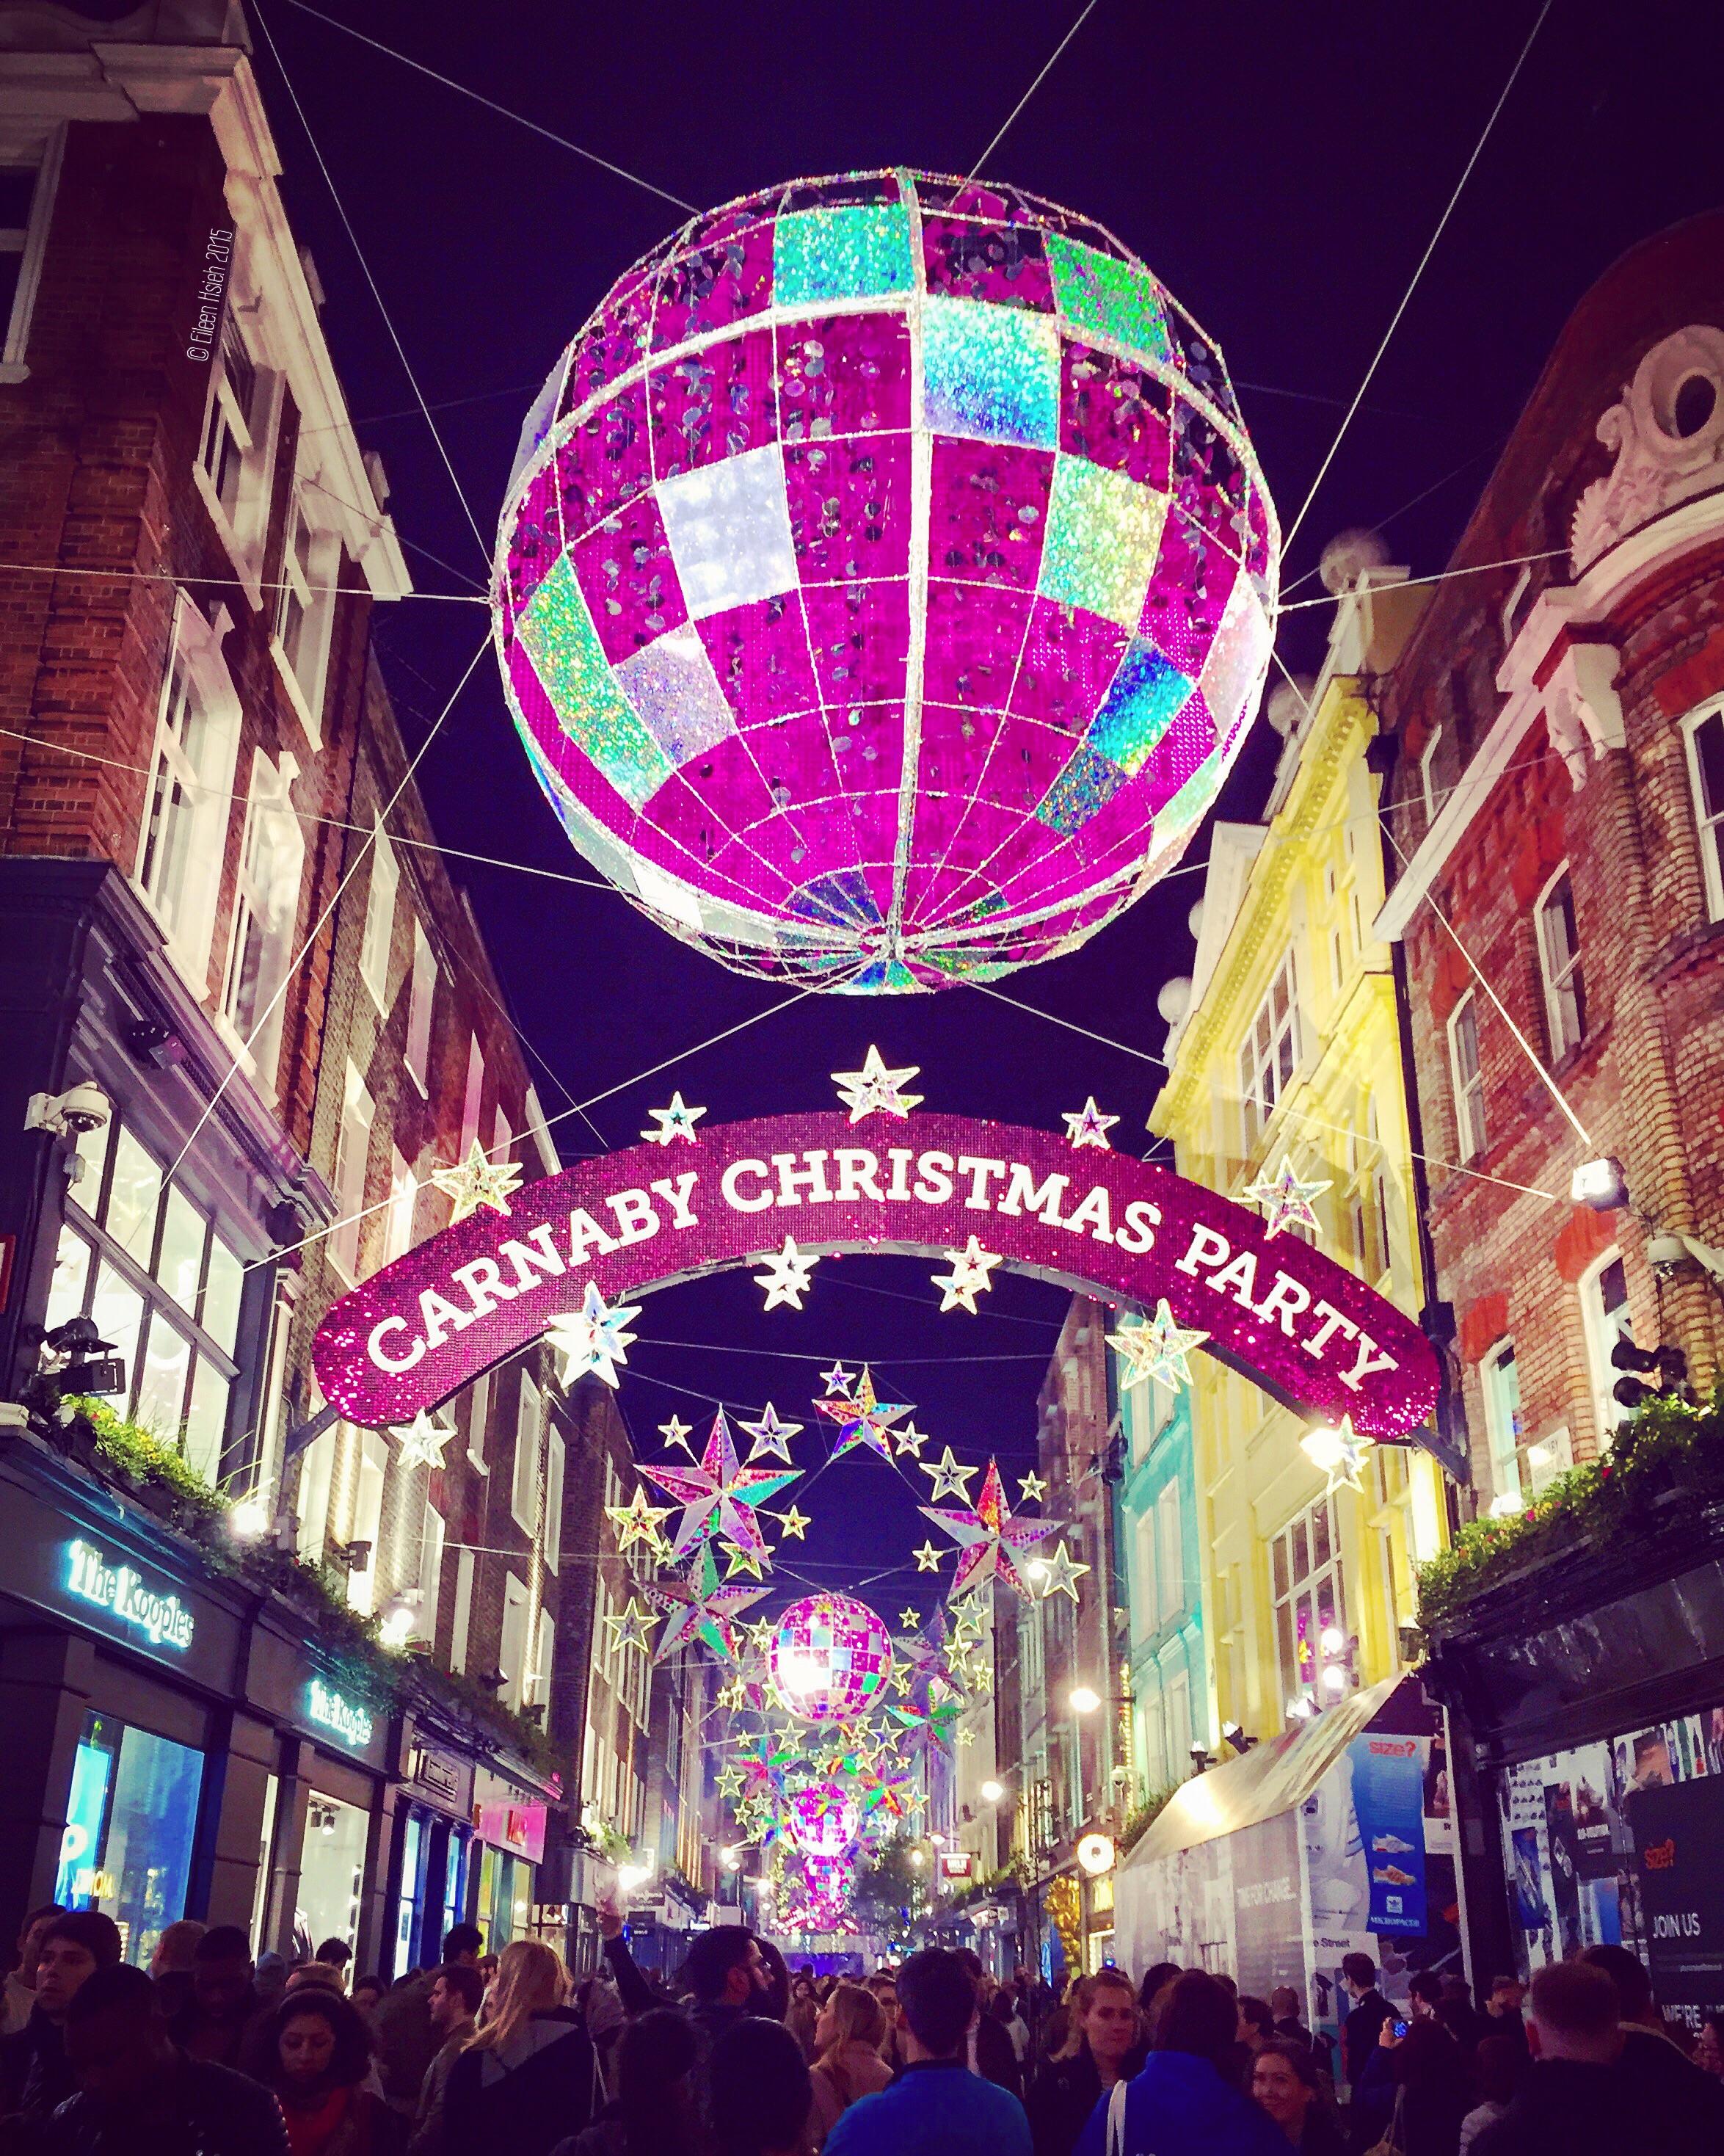 Carnaby Street 盛大的街頭派對吸引了不少民眾與遊客來共襄盛舉。